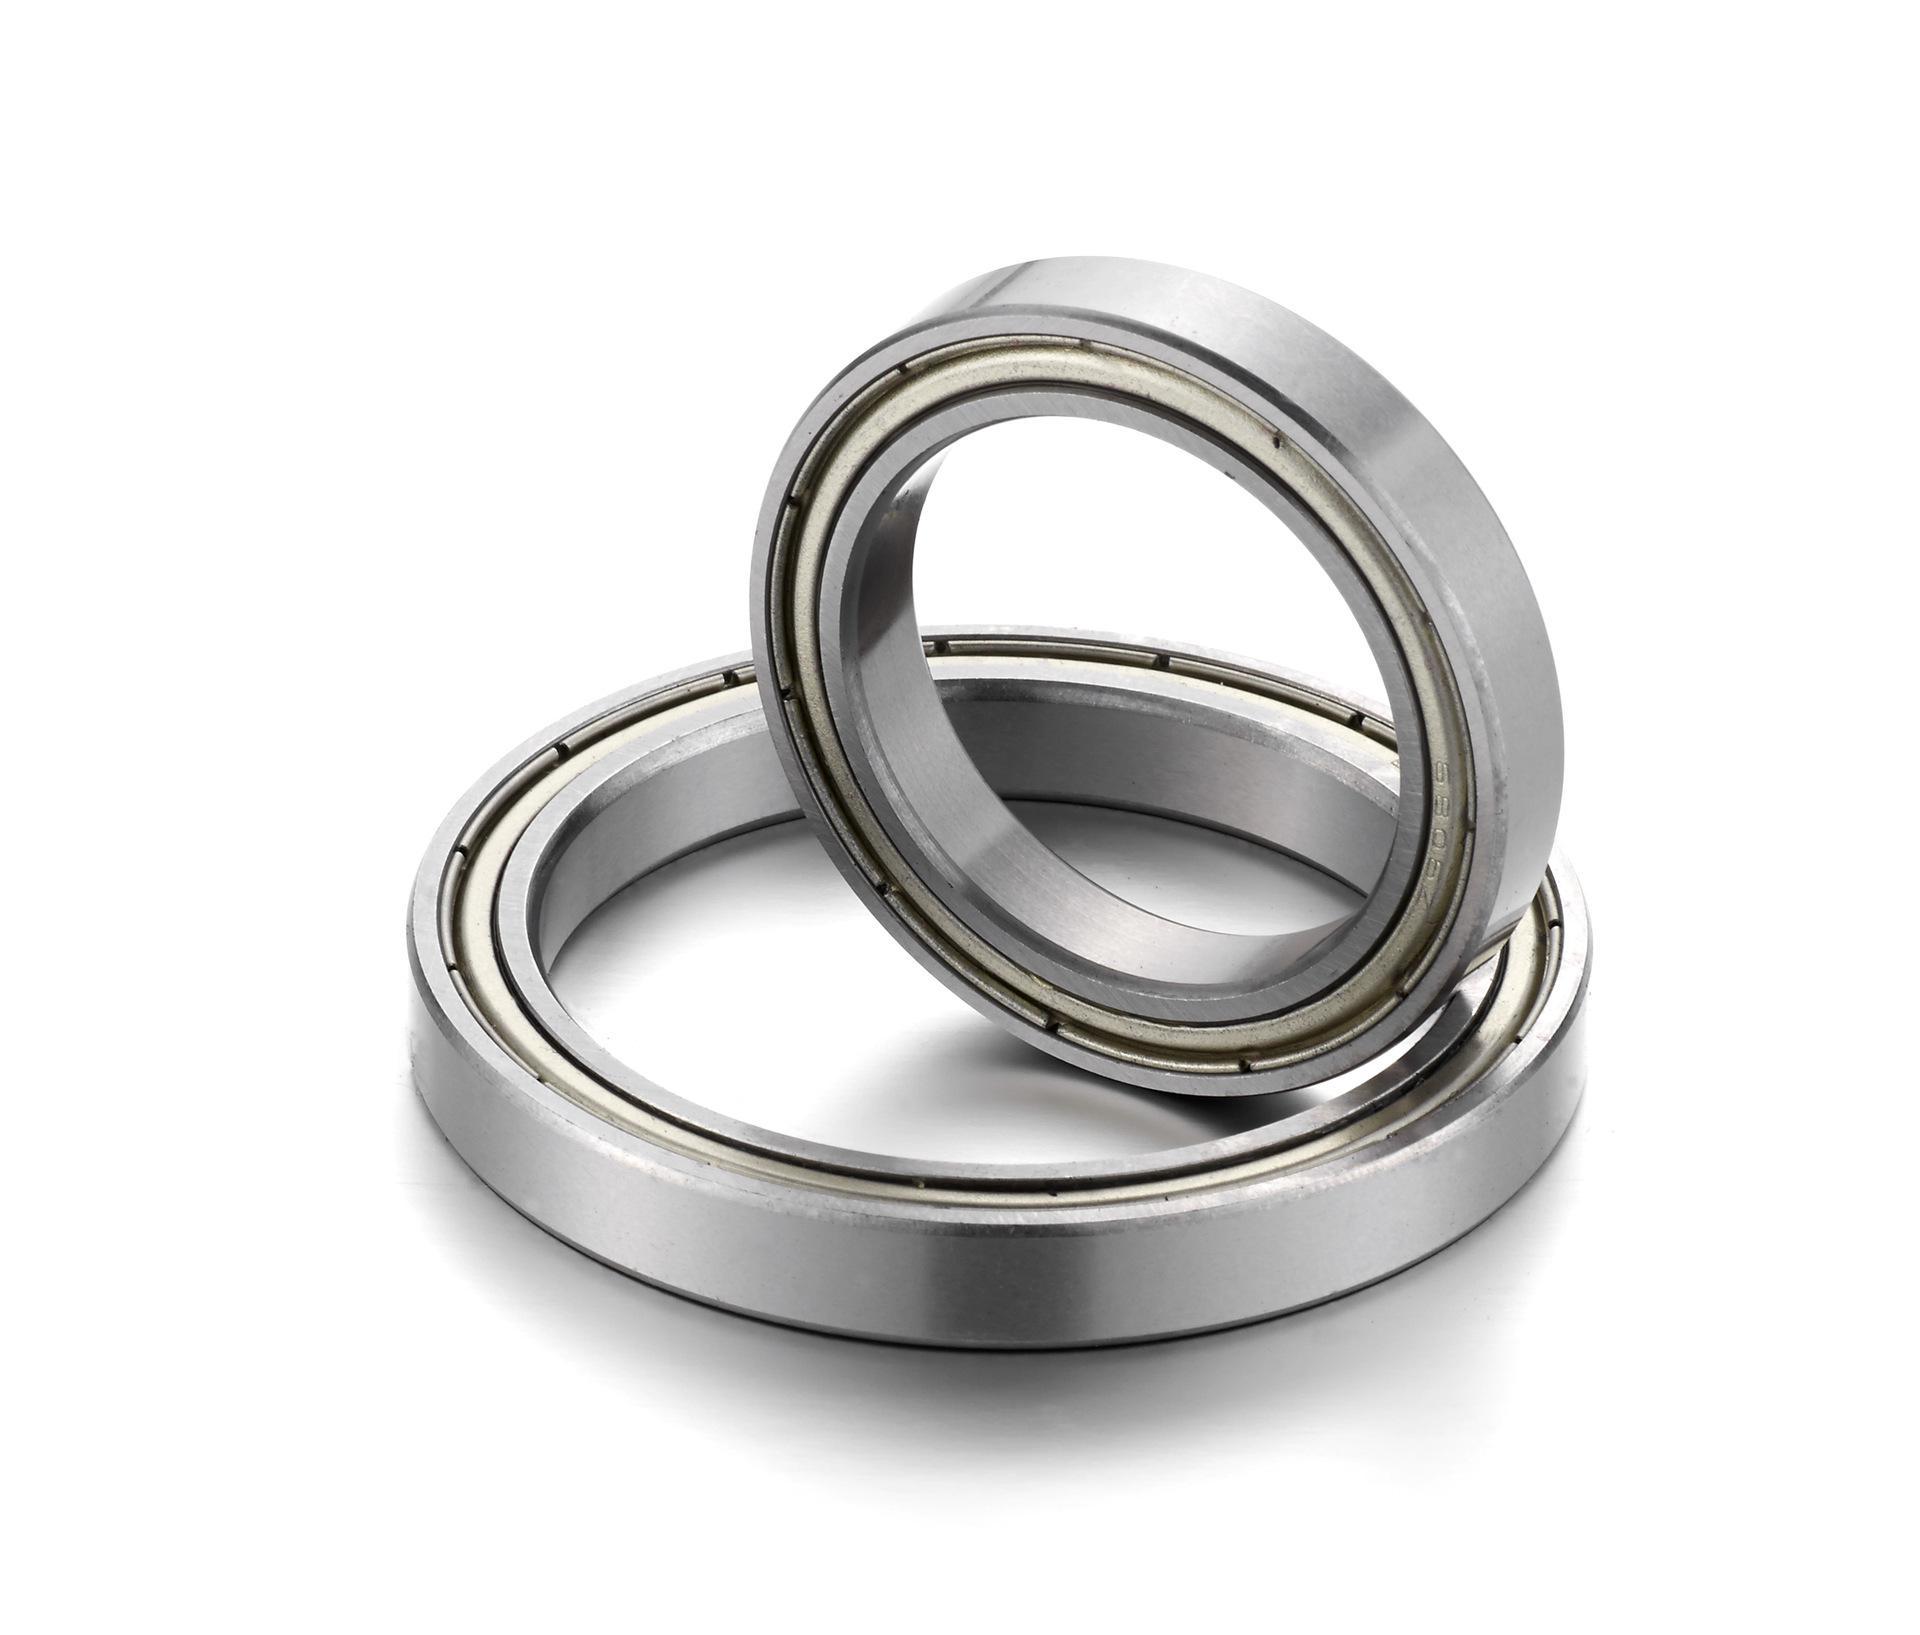 6915ZZ ABEC-1 (2PCS)  75x105x16MM  Metric Thin Section Bearings 61915ZZ 6915Z 1pcs 71901 71901cd p4 7901 12x24x6 mochu thin walled miniature angular contact bearings speed spindle bearings cnc abec 7